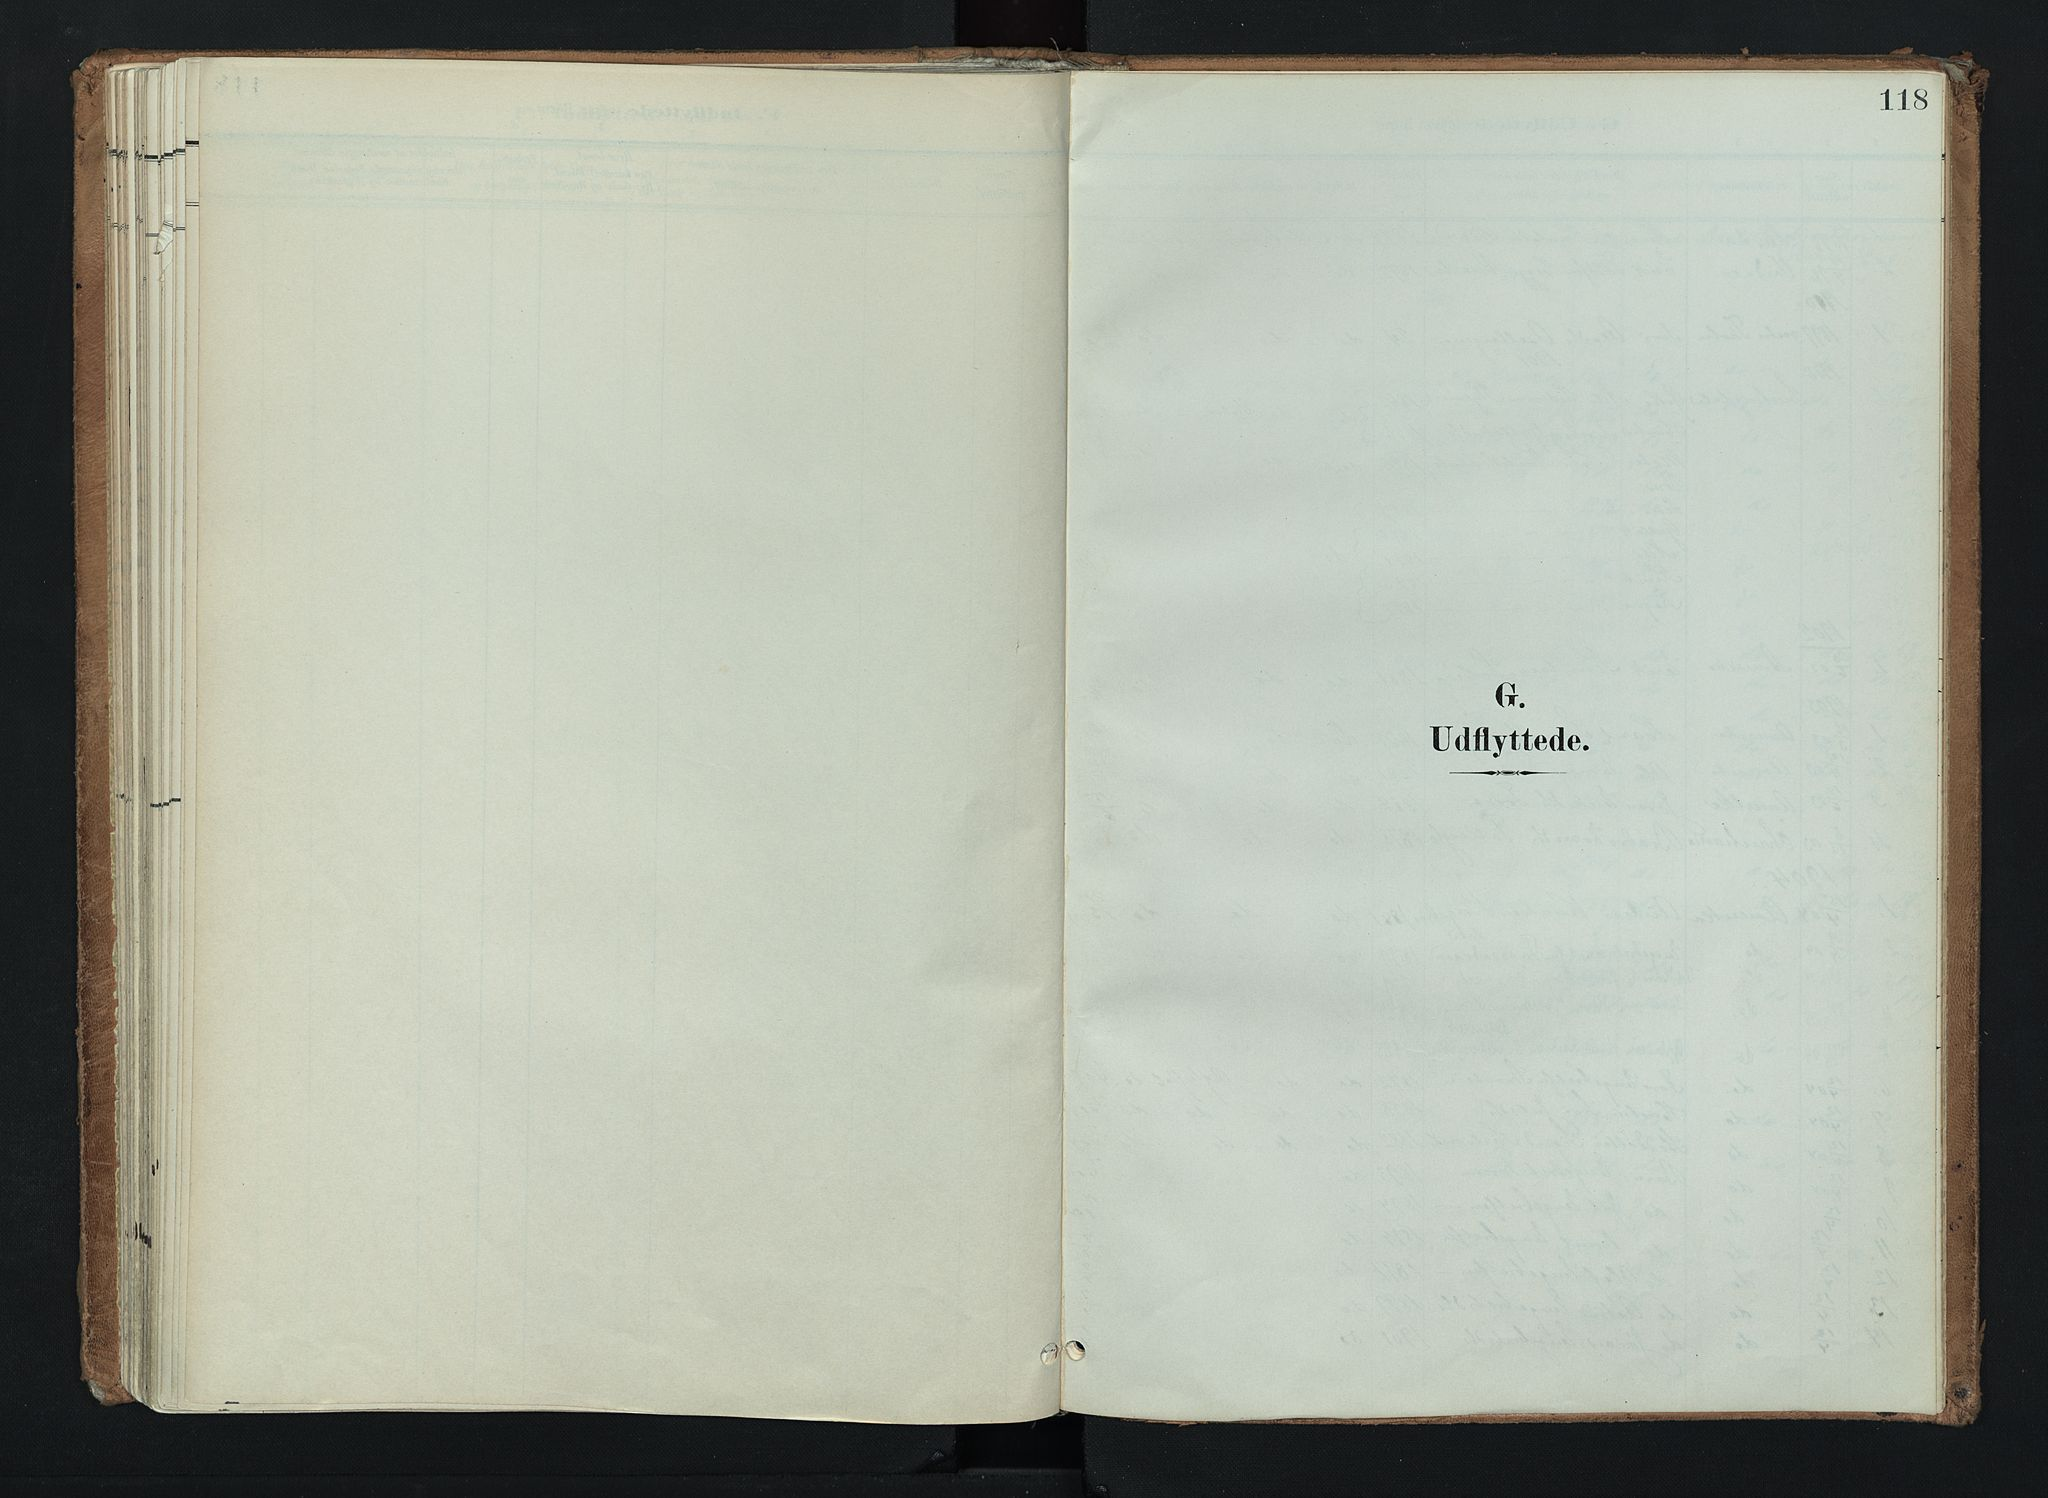 SAH, Nord-Aurdal prestekontor, Ministerialbok nr. 16, 1897-1925, s. 118